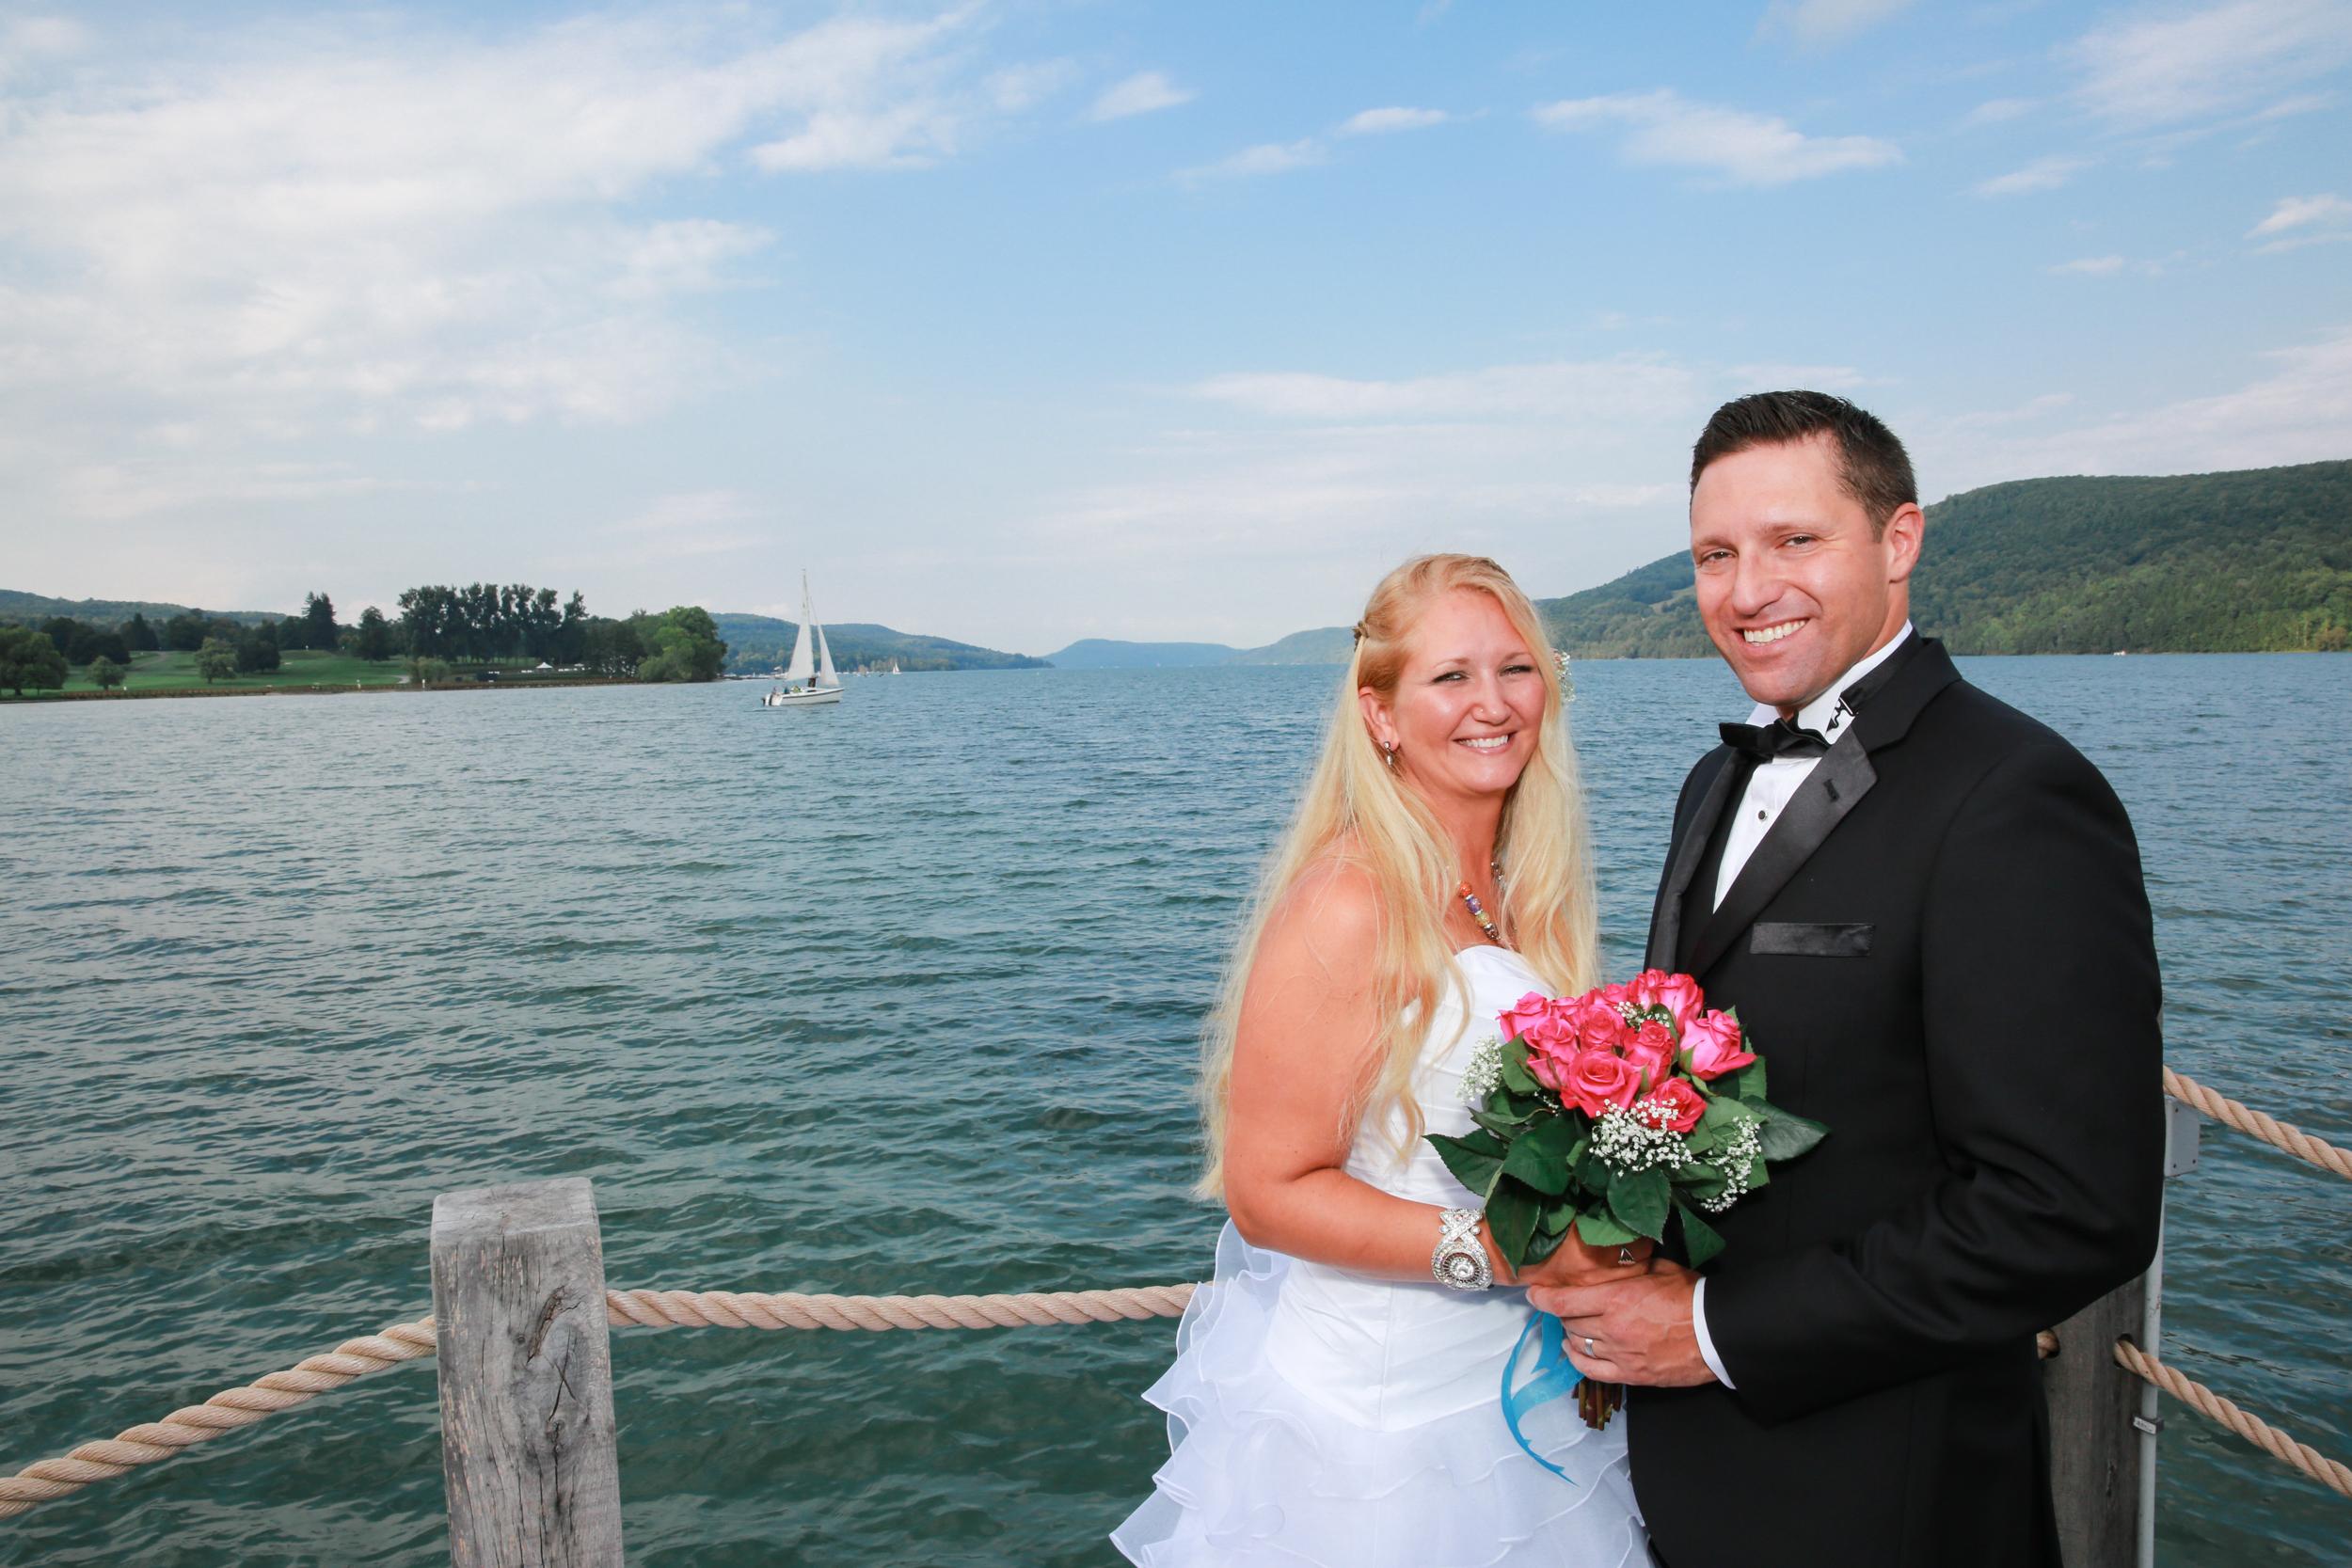 Formal wedding photo in Lake George